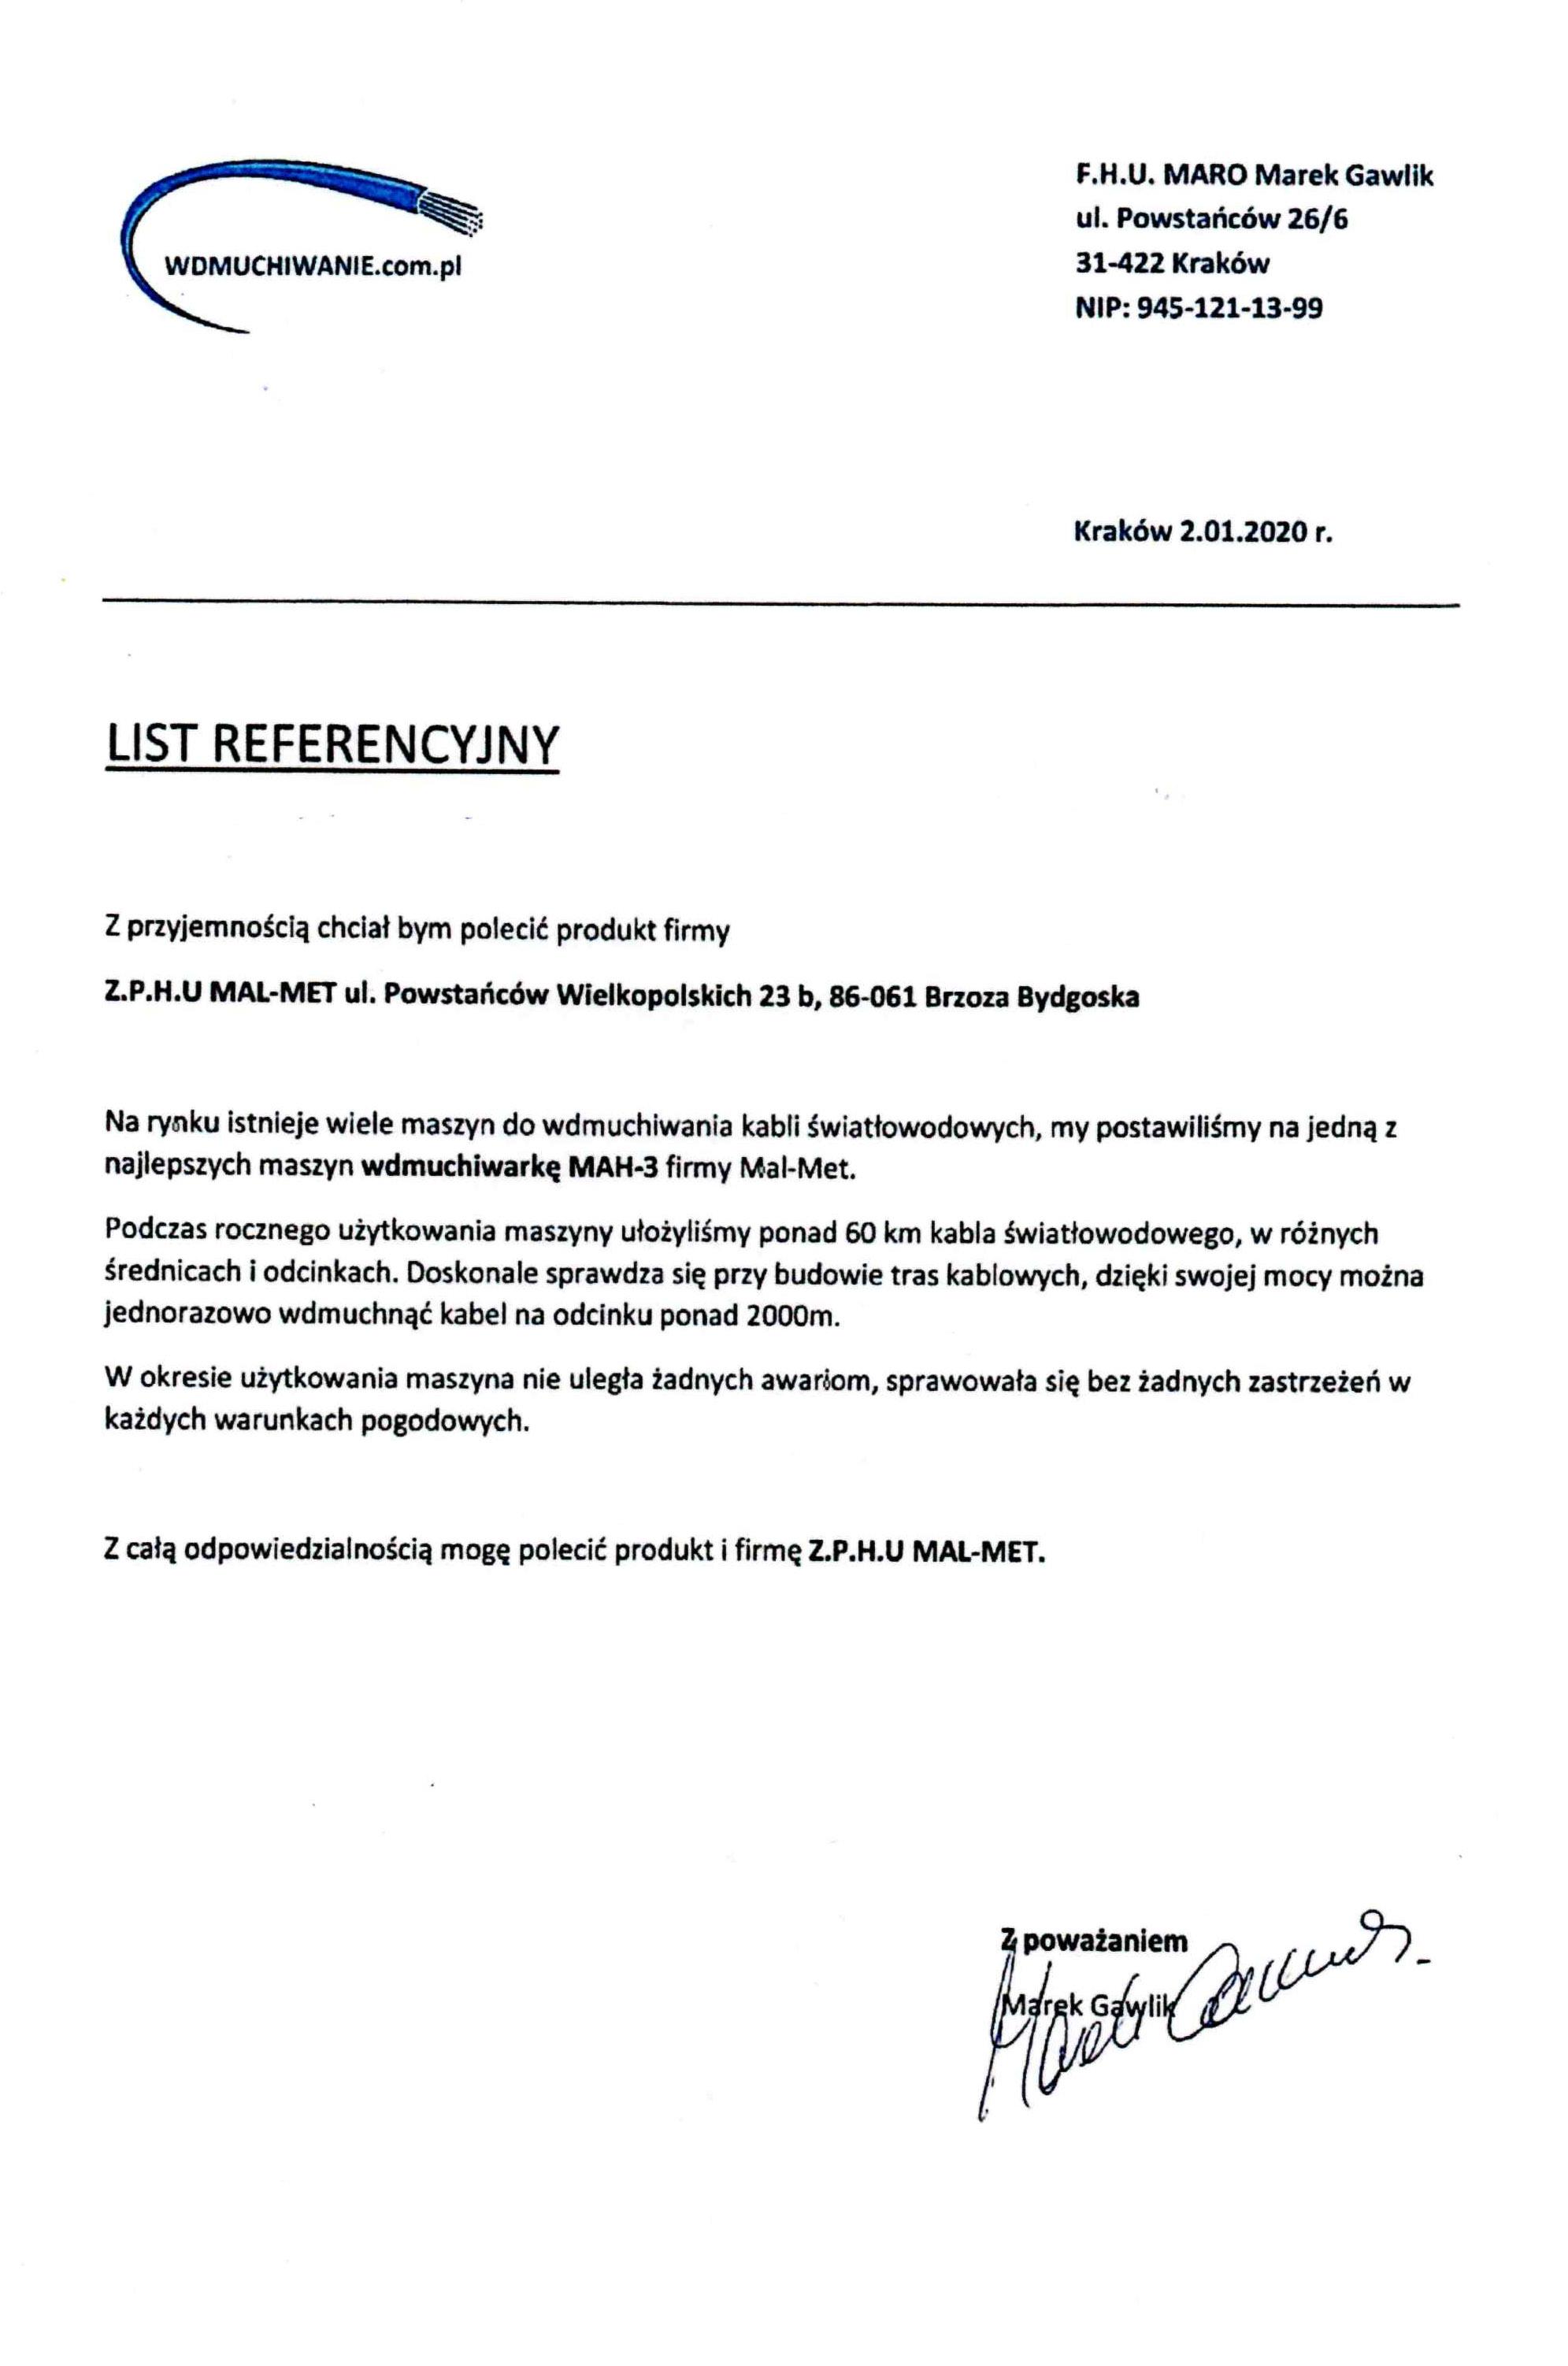 referencje - FHU Maro